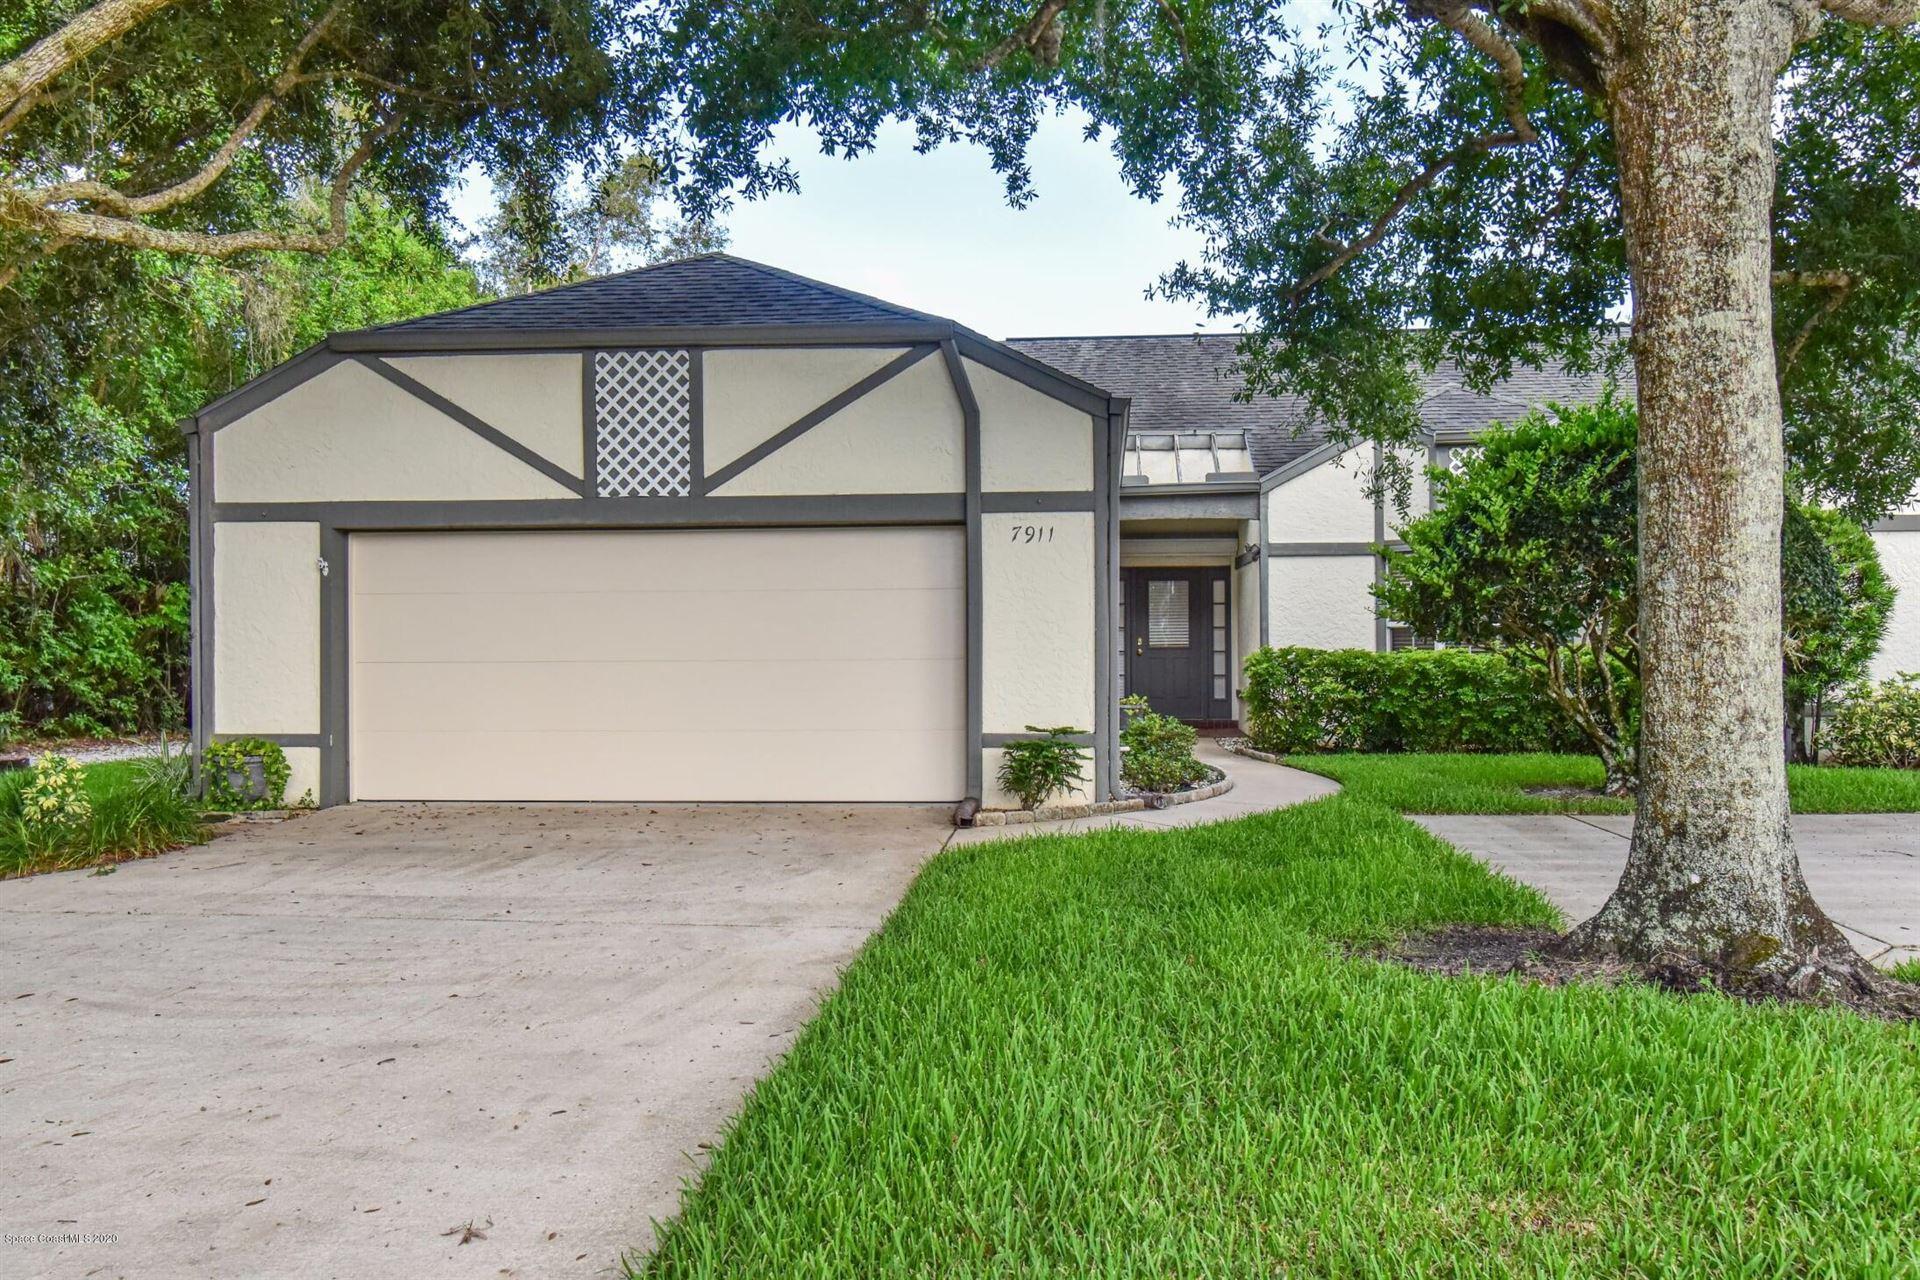 7911 Cambridge Manor, Vero Beach, FL 32966 - #: 879149